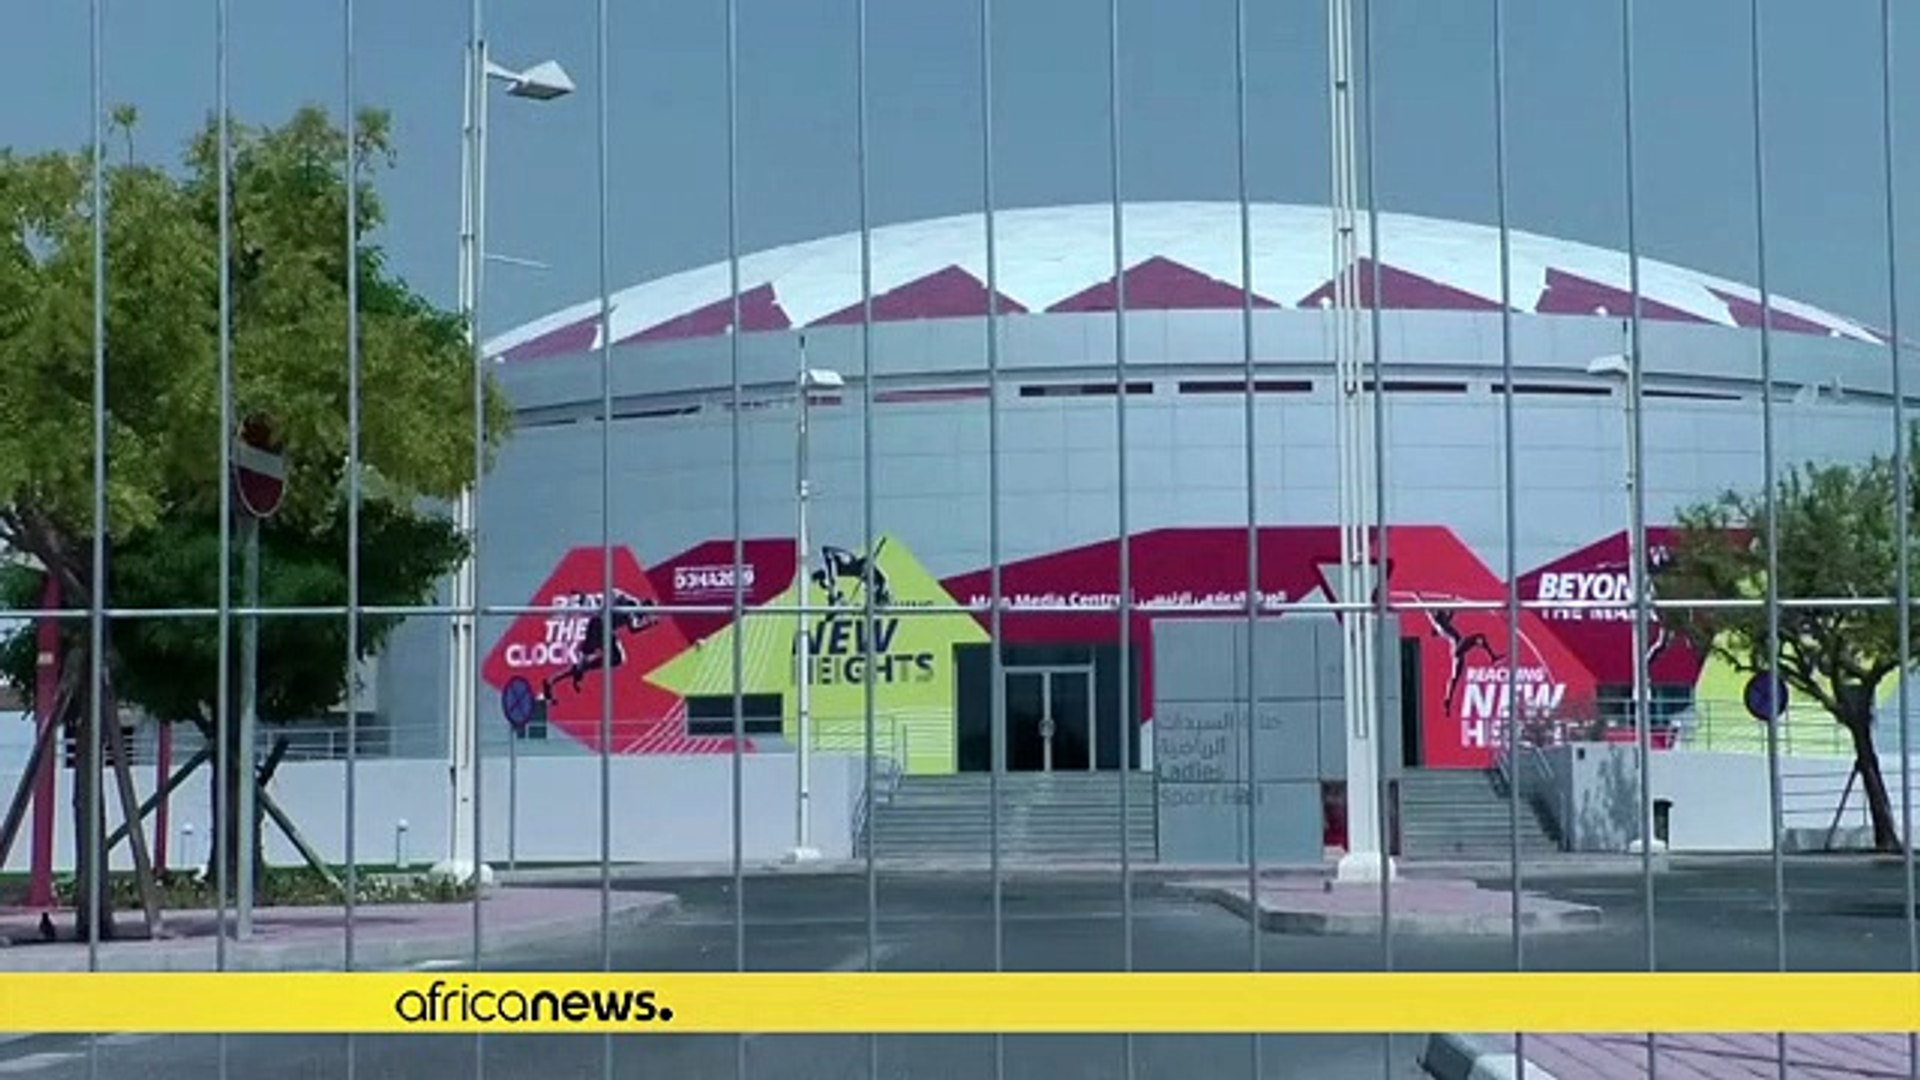 Qatar stadium ready for world athletics championships